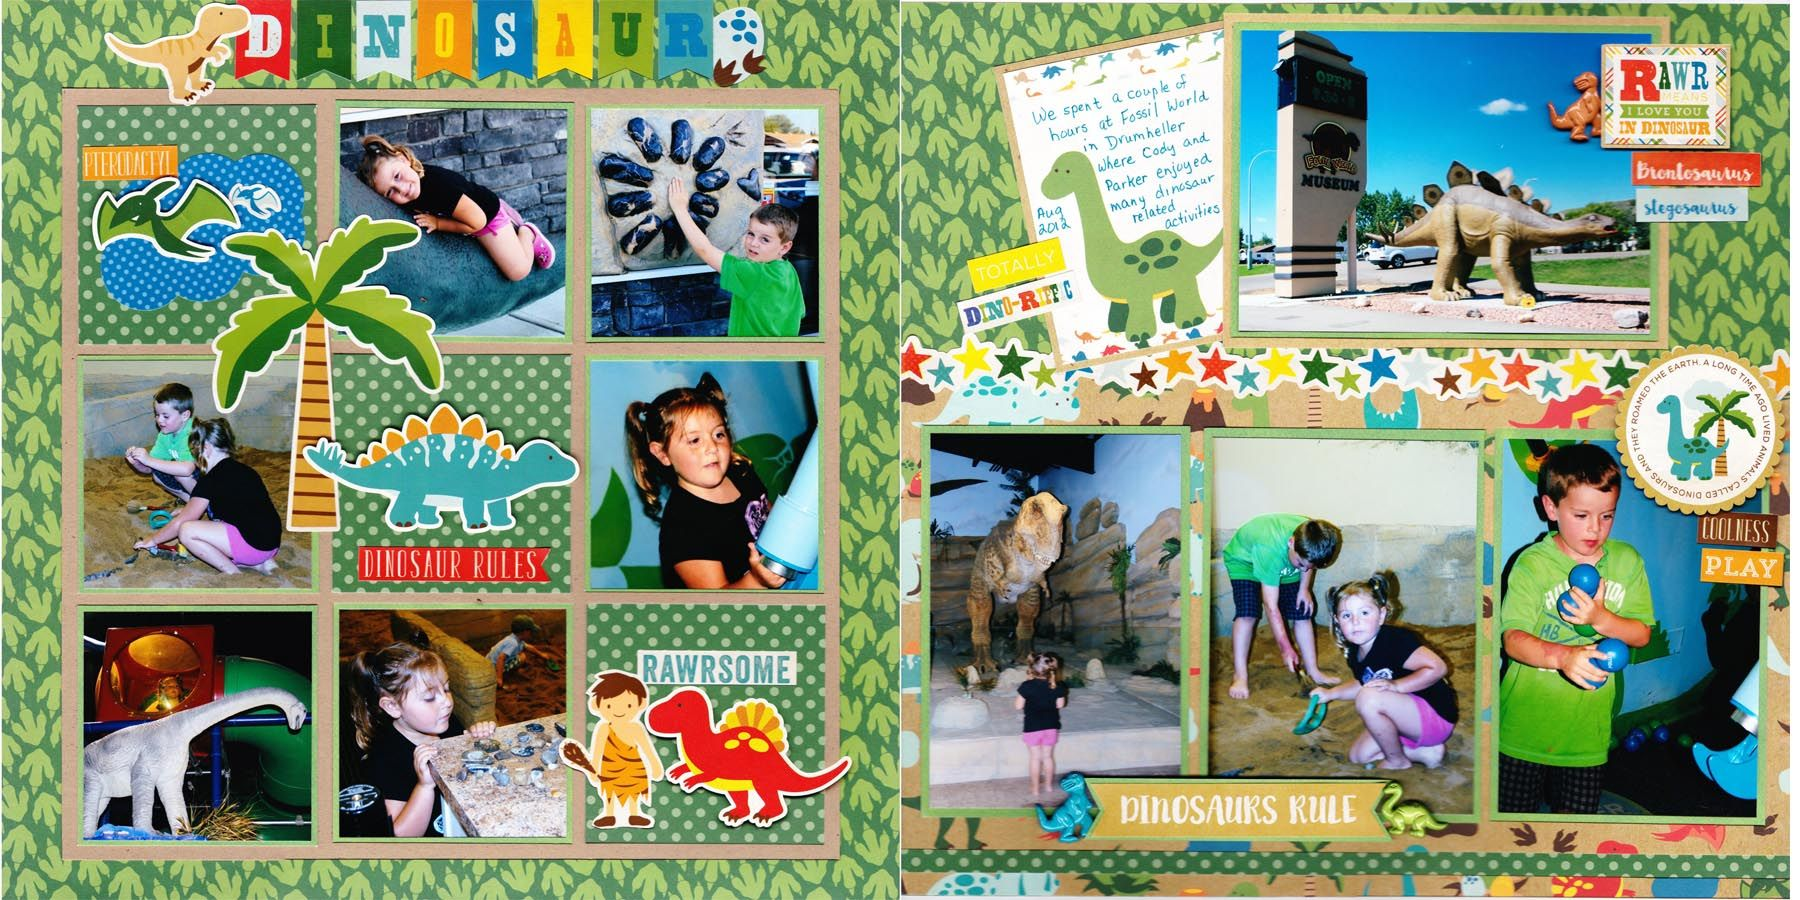 Dinosaur - Echo Park - Dino Friends Collection #dinosaurpics